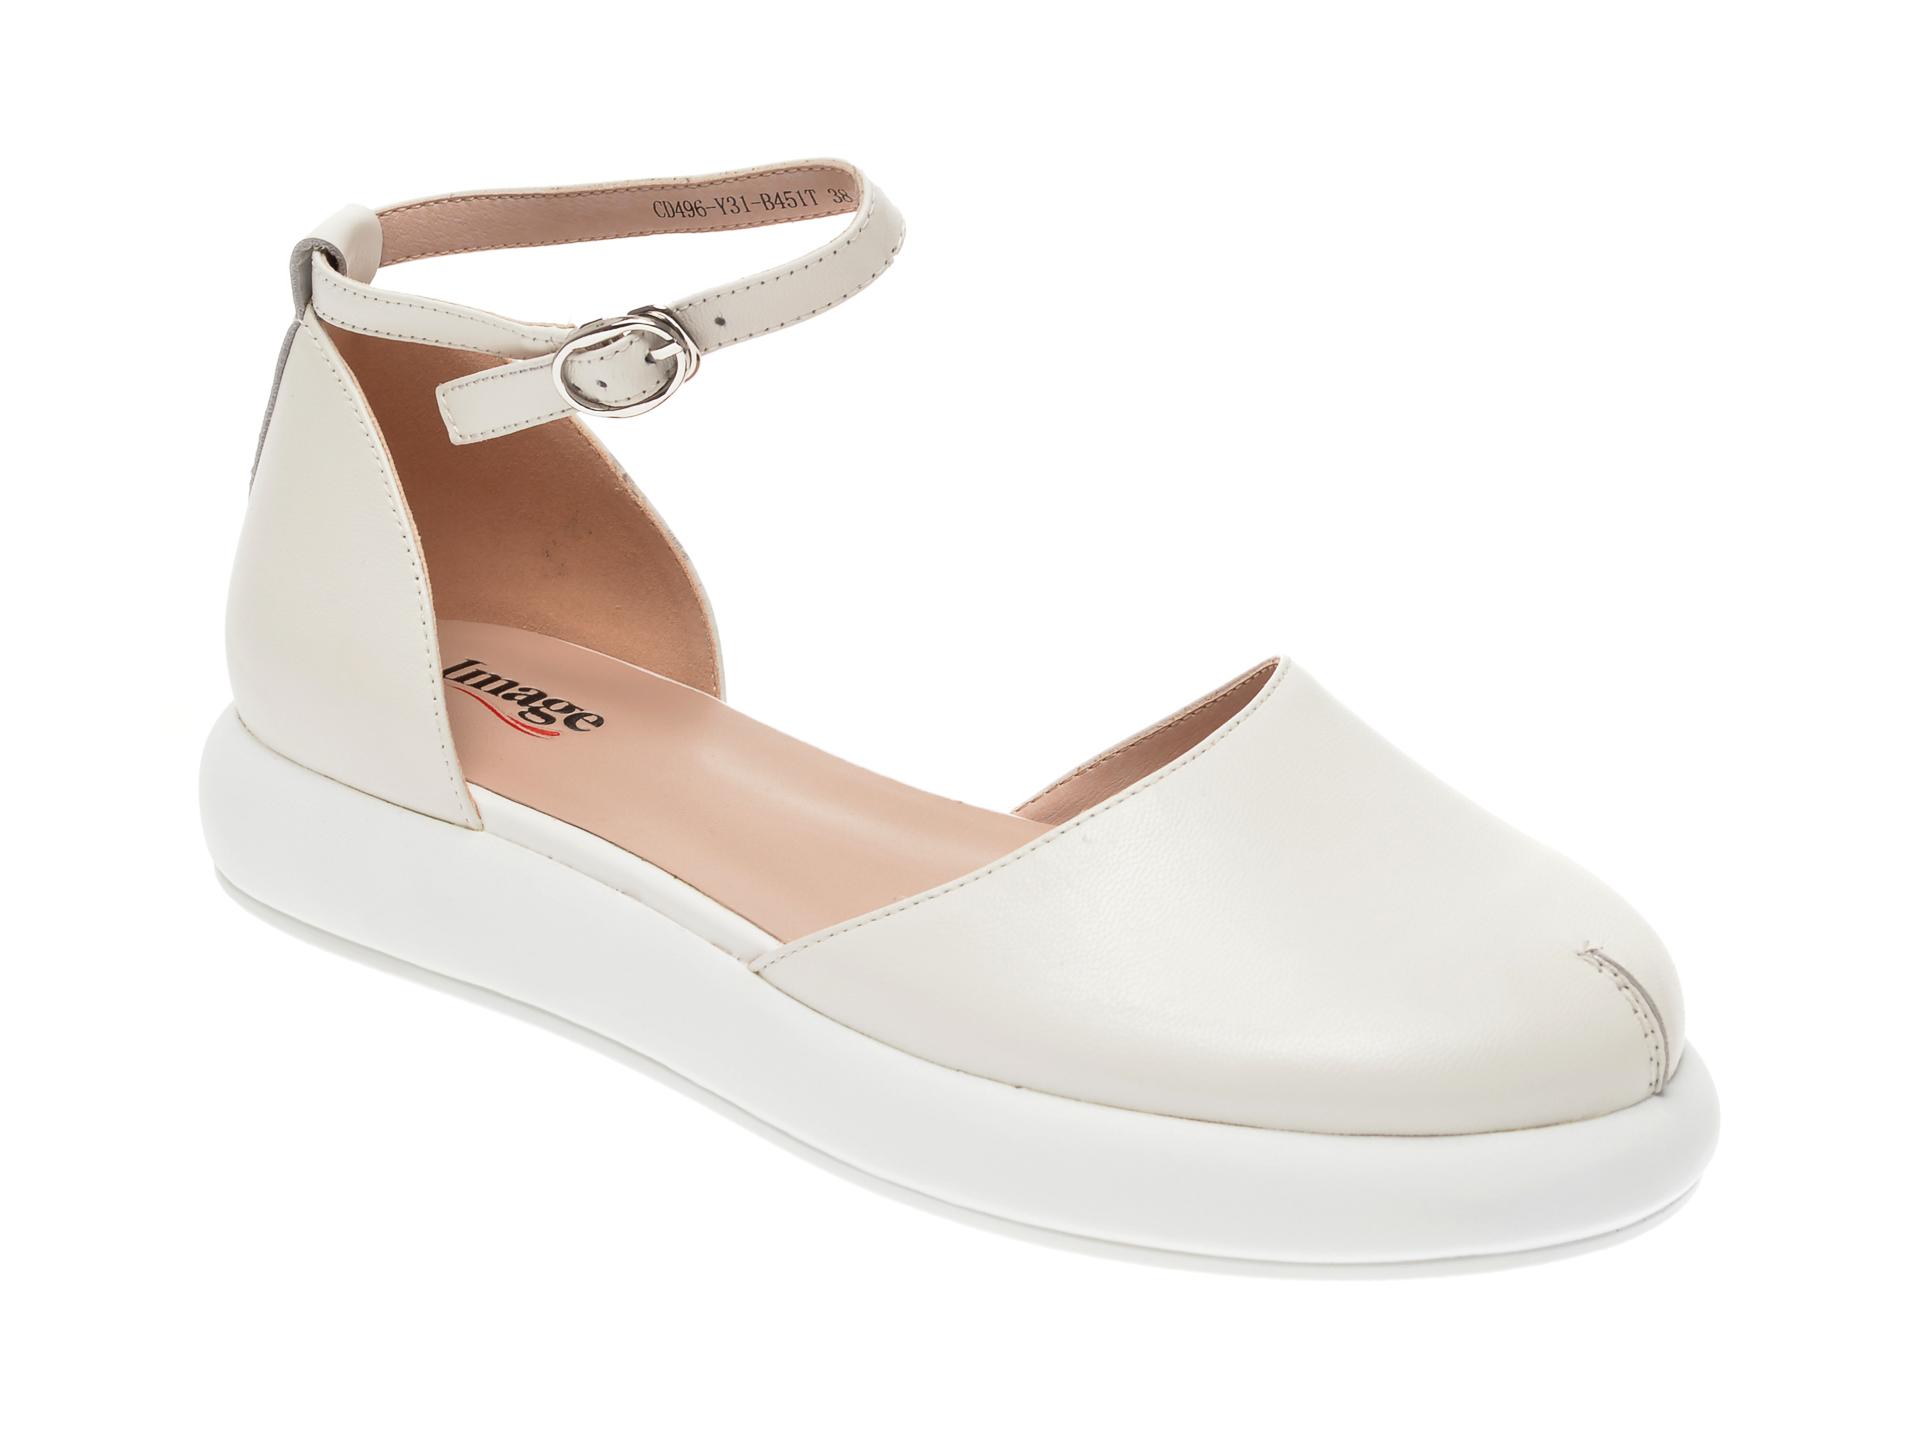 Pantofi IMAGE albi, CD496Y3, din piele naturala imagine